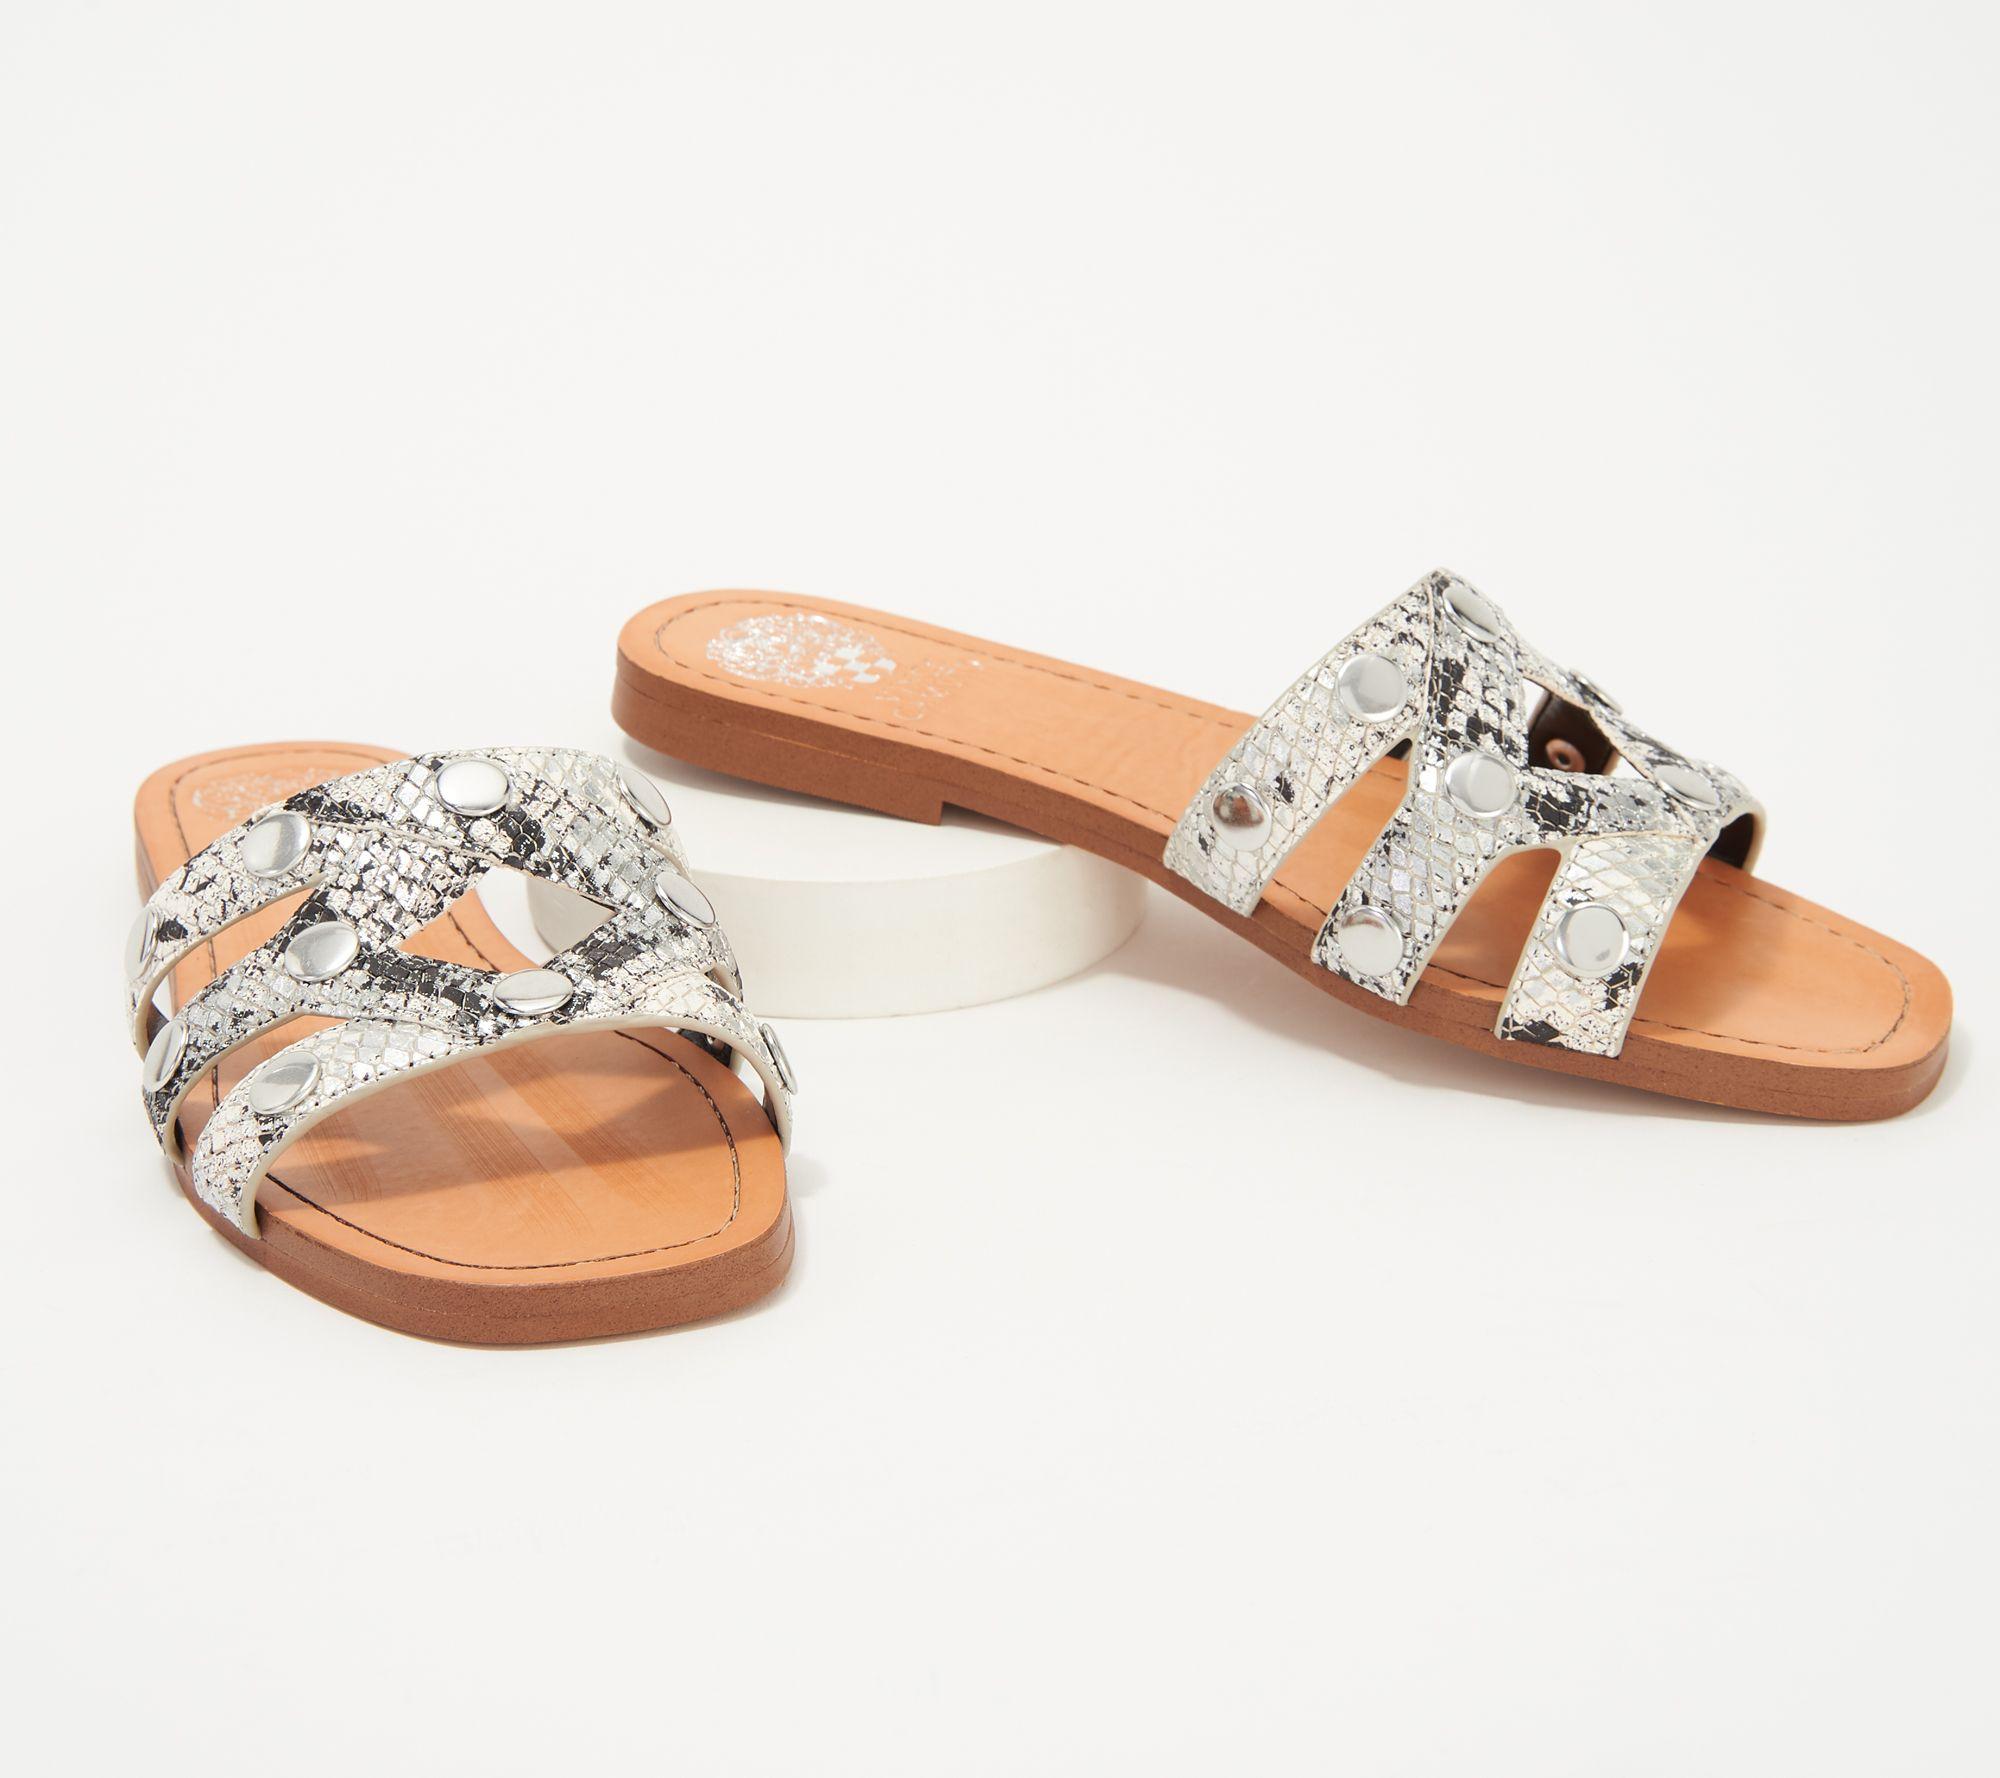 5966a9ab53df Vince Camuto Studded Slide Sandals Vazista — QVC.com